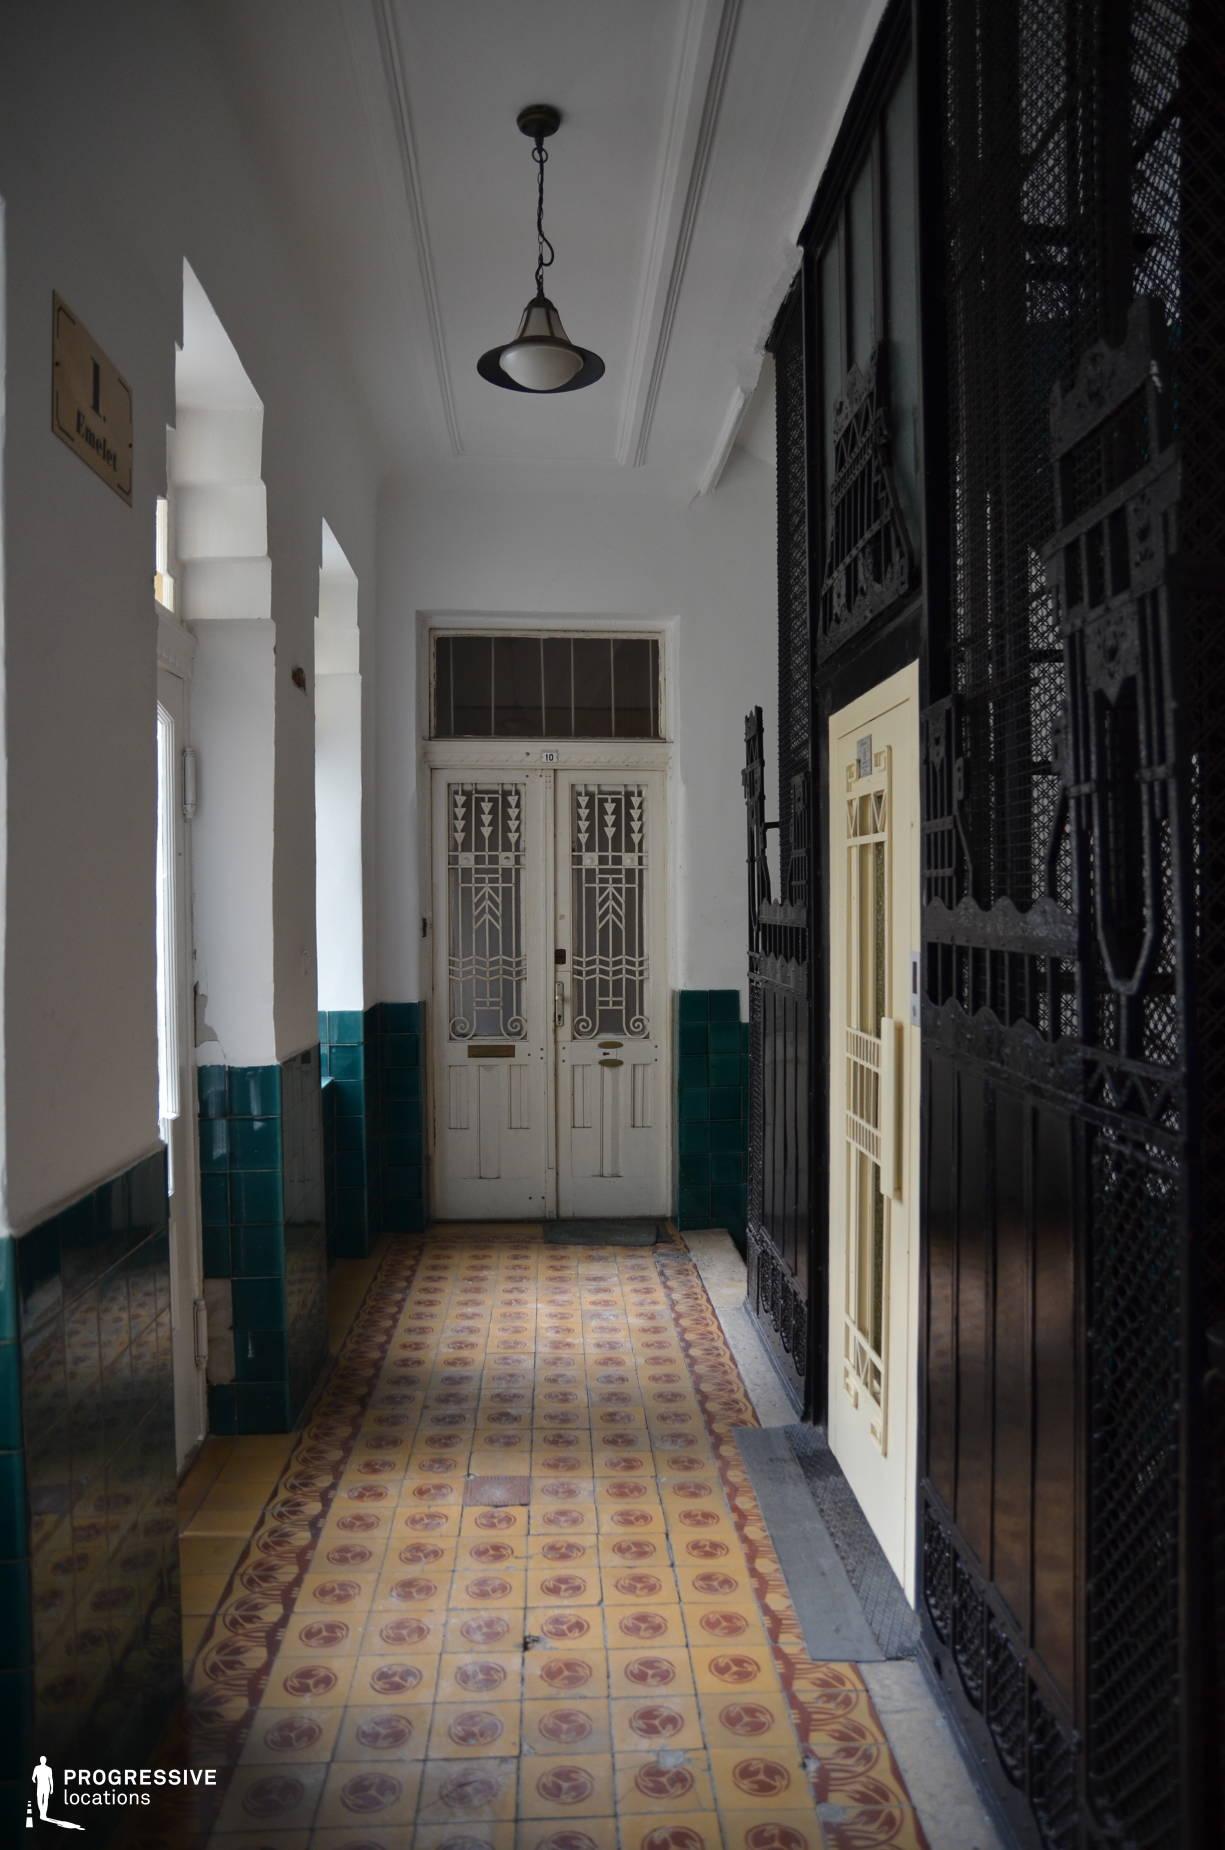 Locations in Budapest: Stairwell, Oktober Street